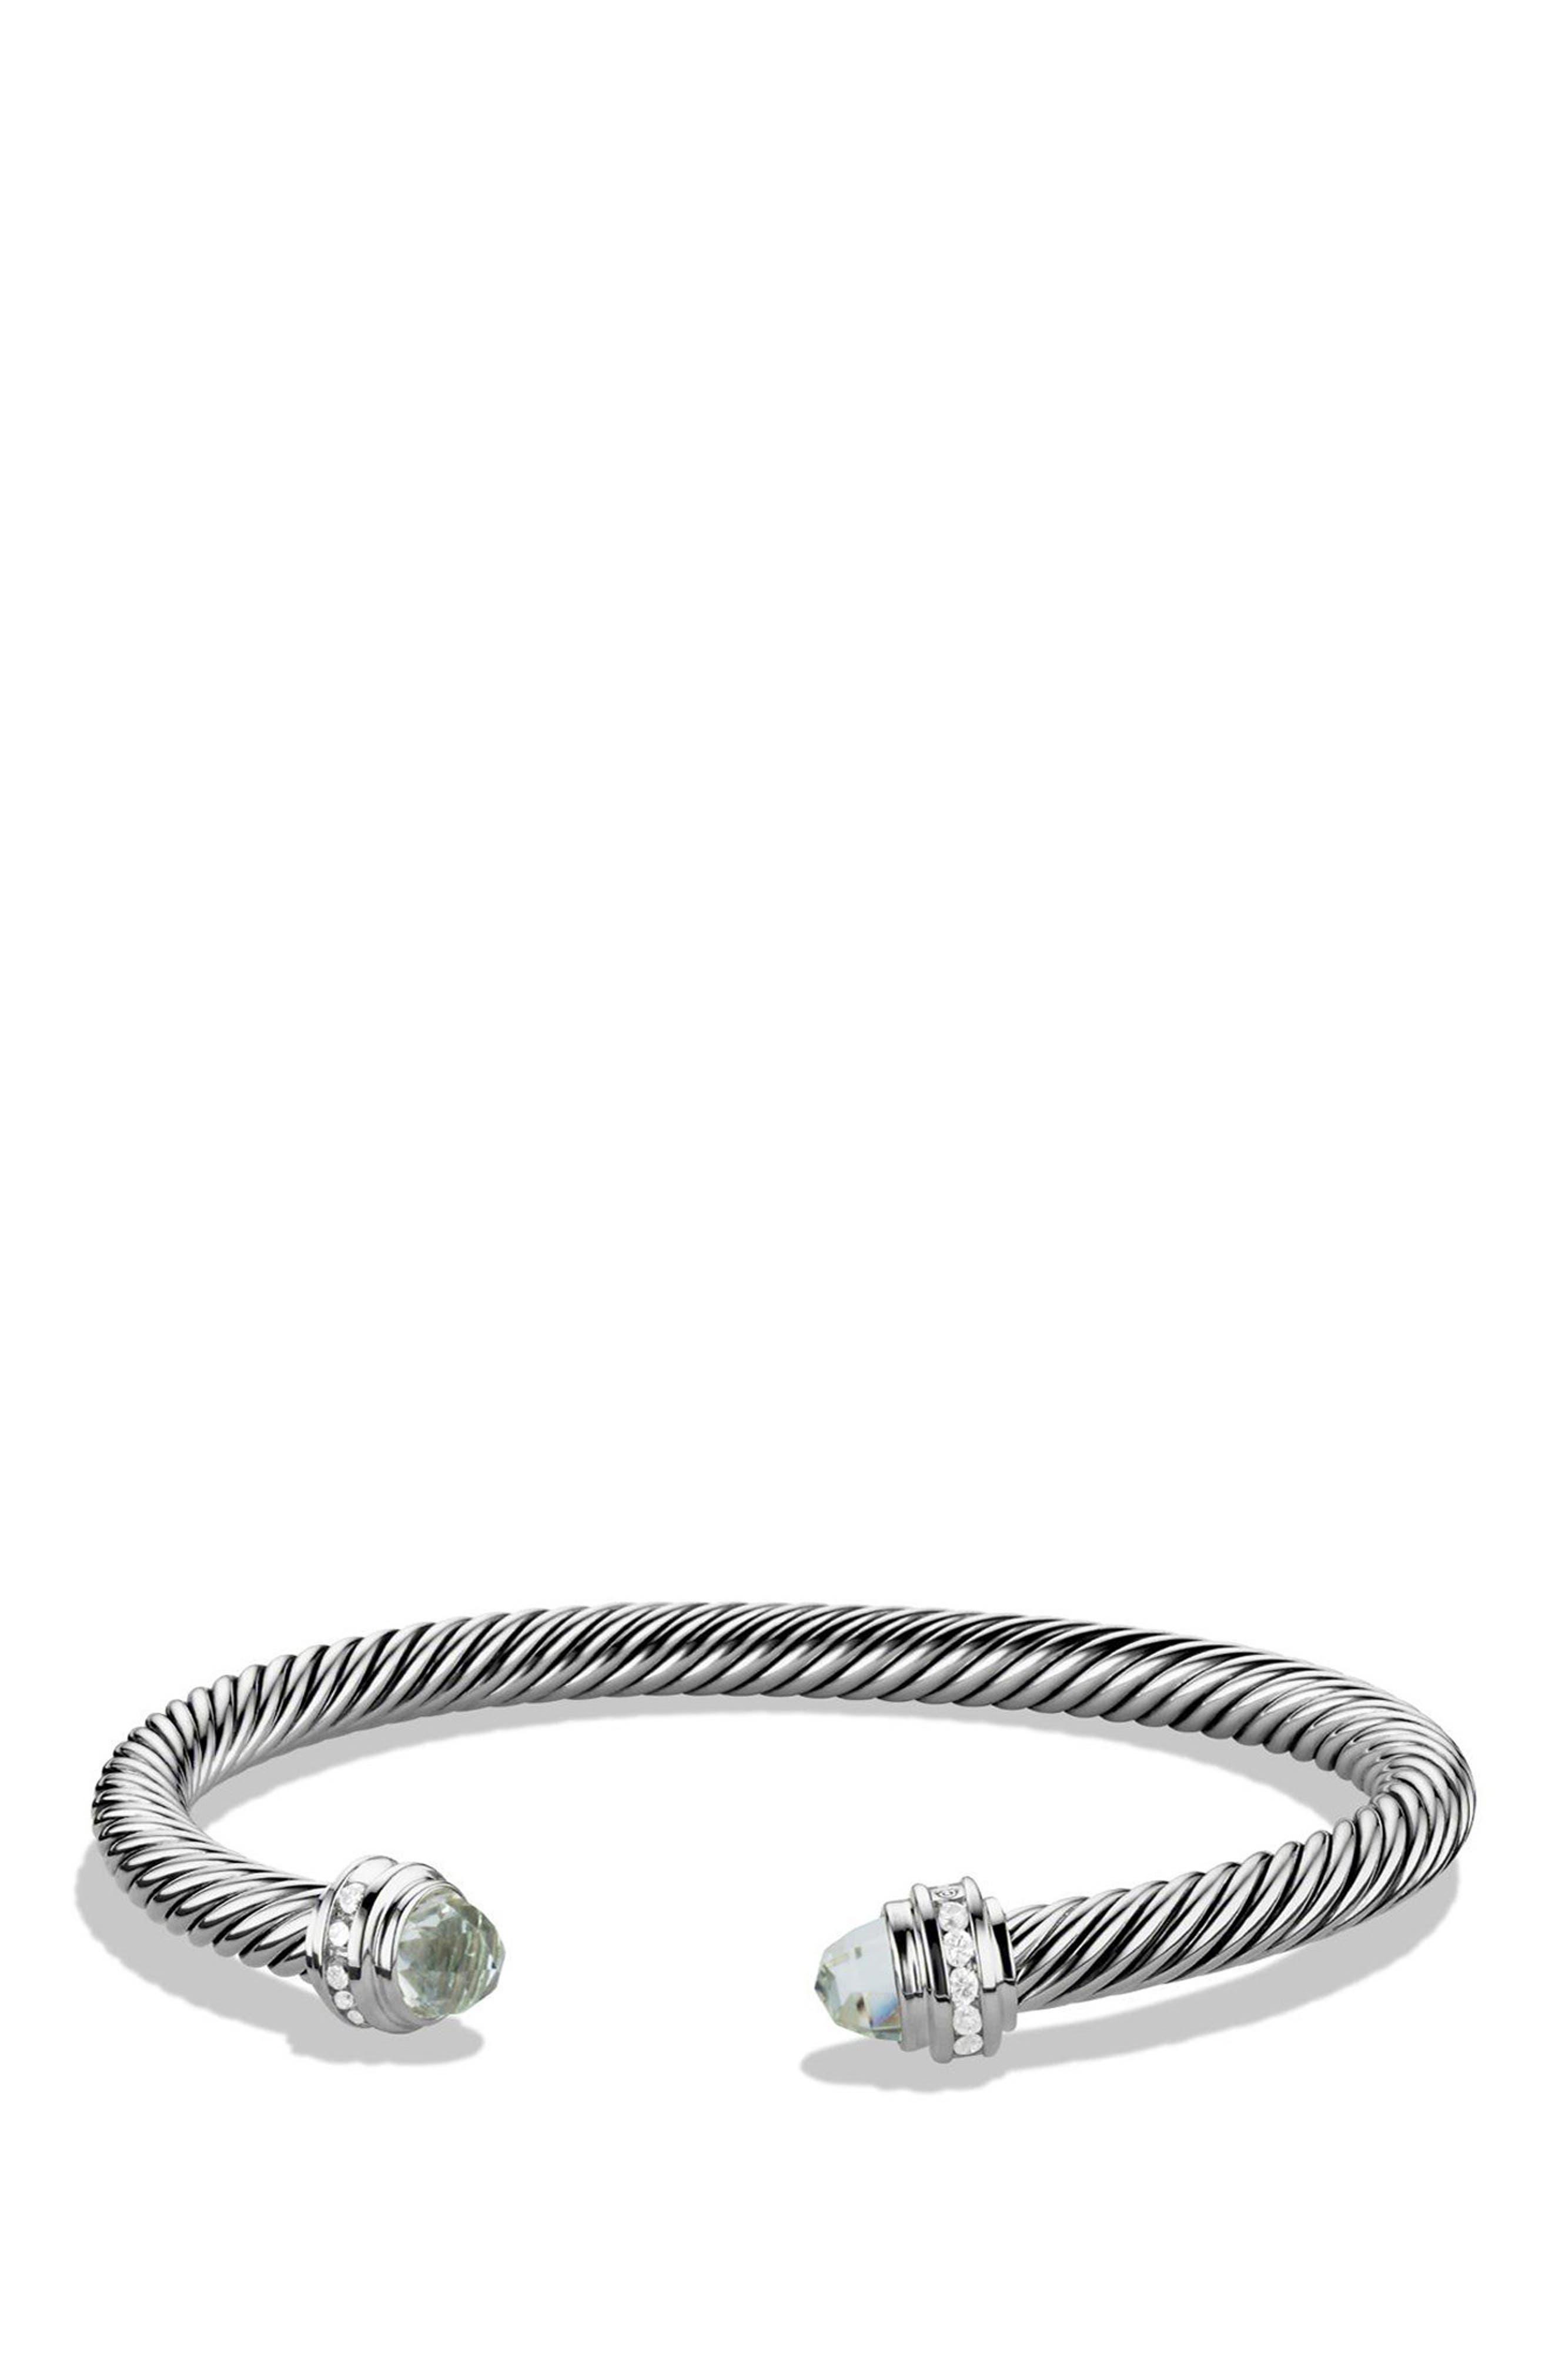 Main Image - David Yurman 'Cable Classics' Bracelet with Semiprecious Stones & Diamonds